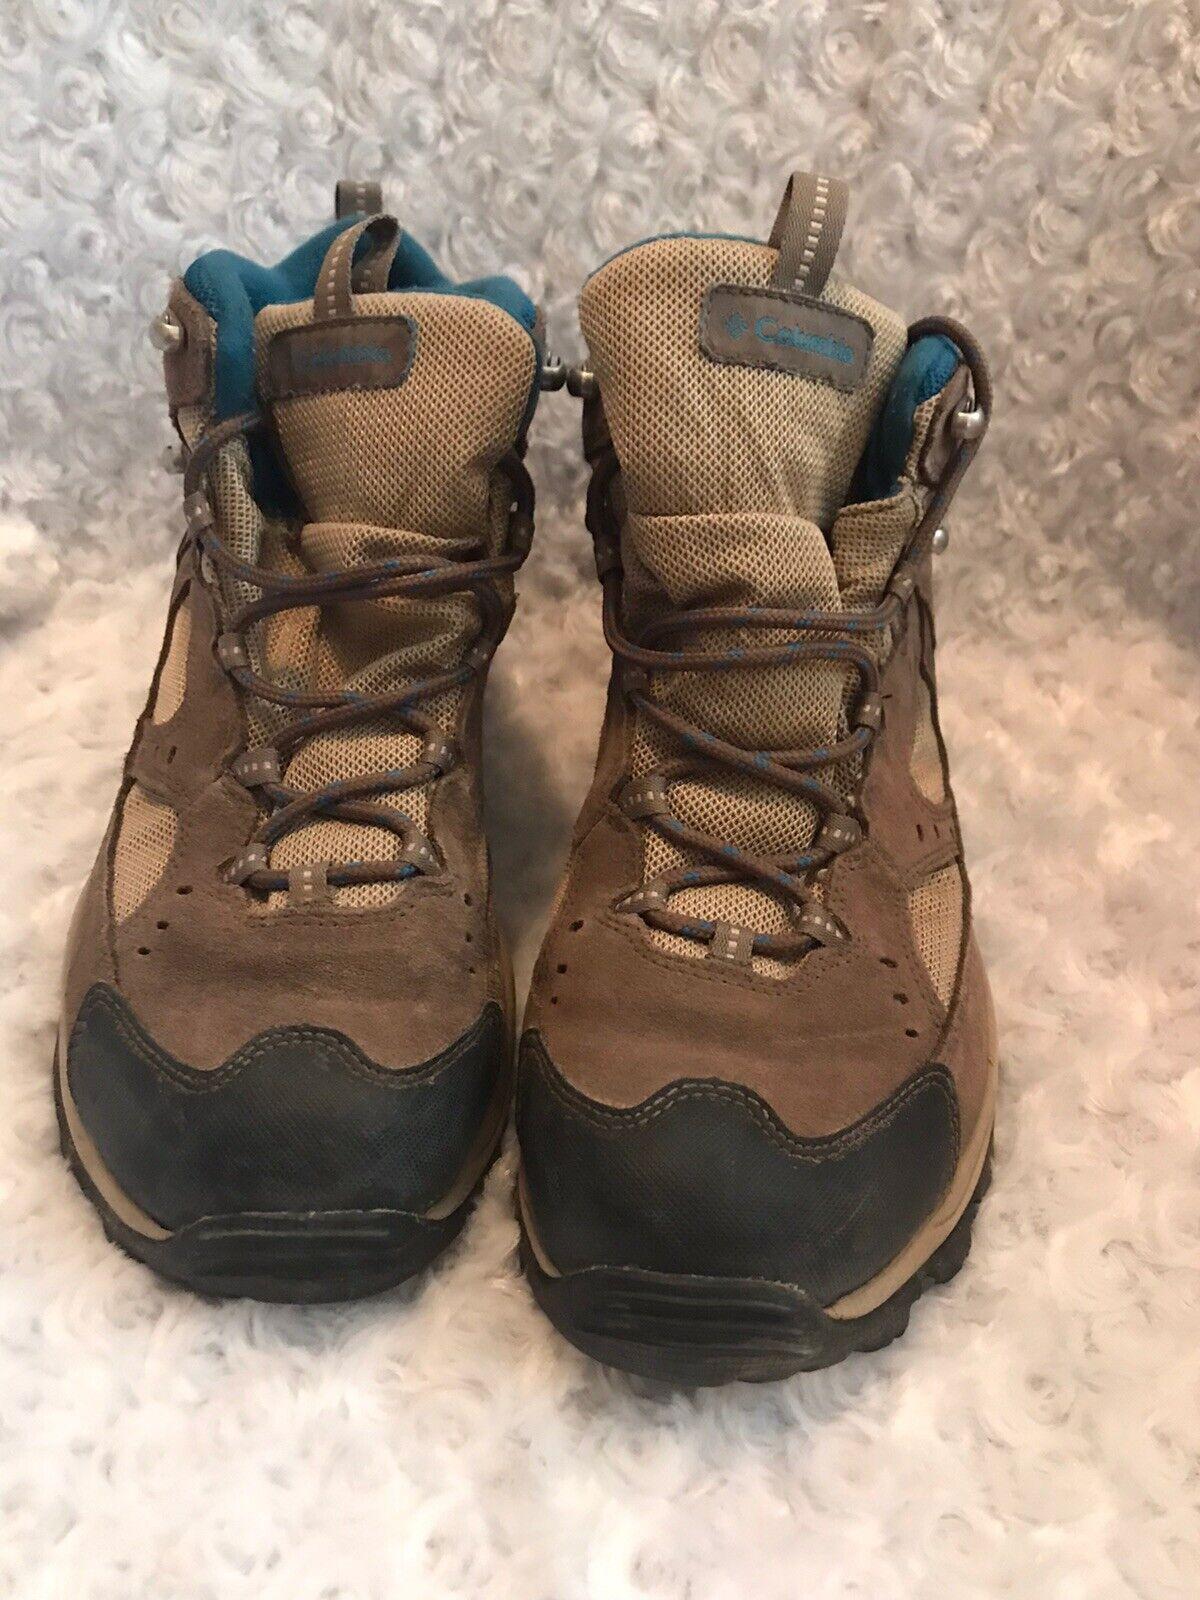 Columbia Women's Size 10.5 Trail Hiking